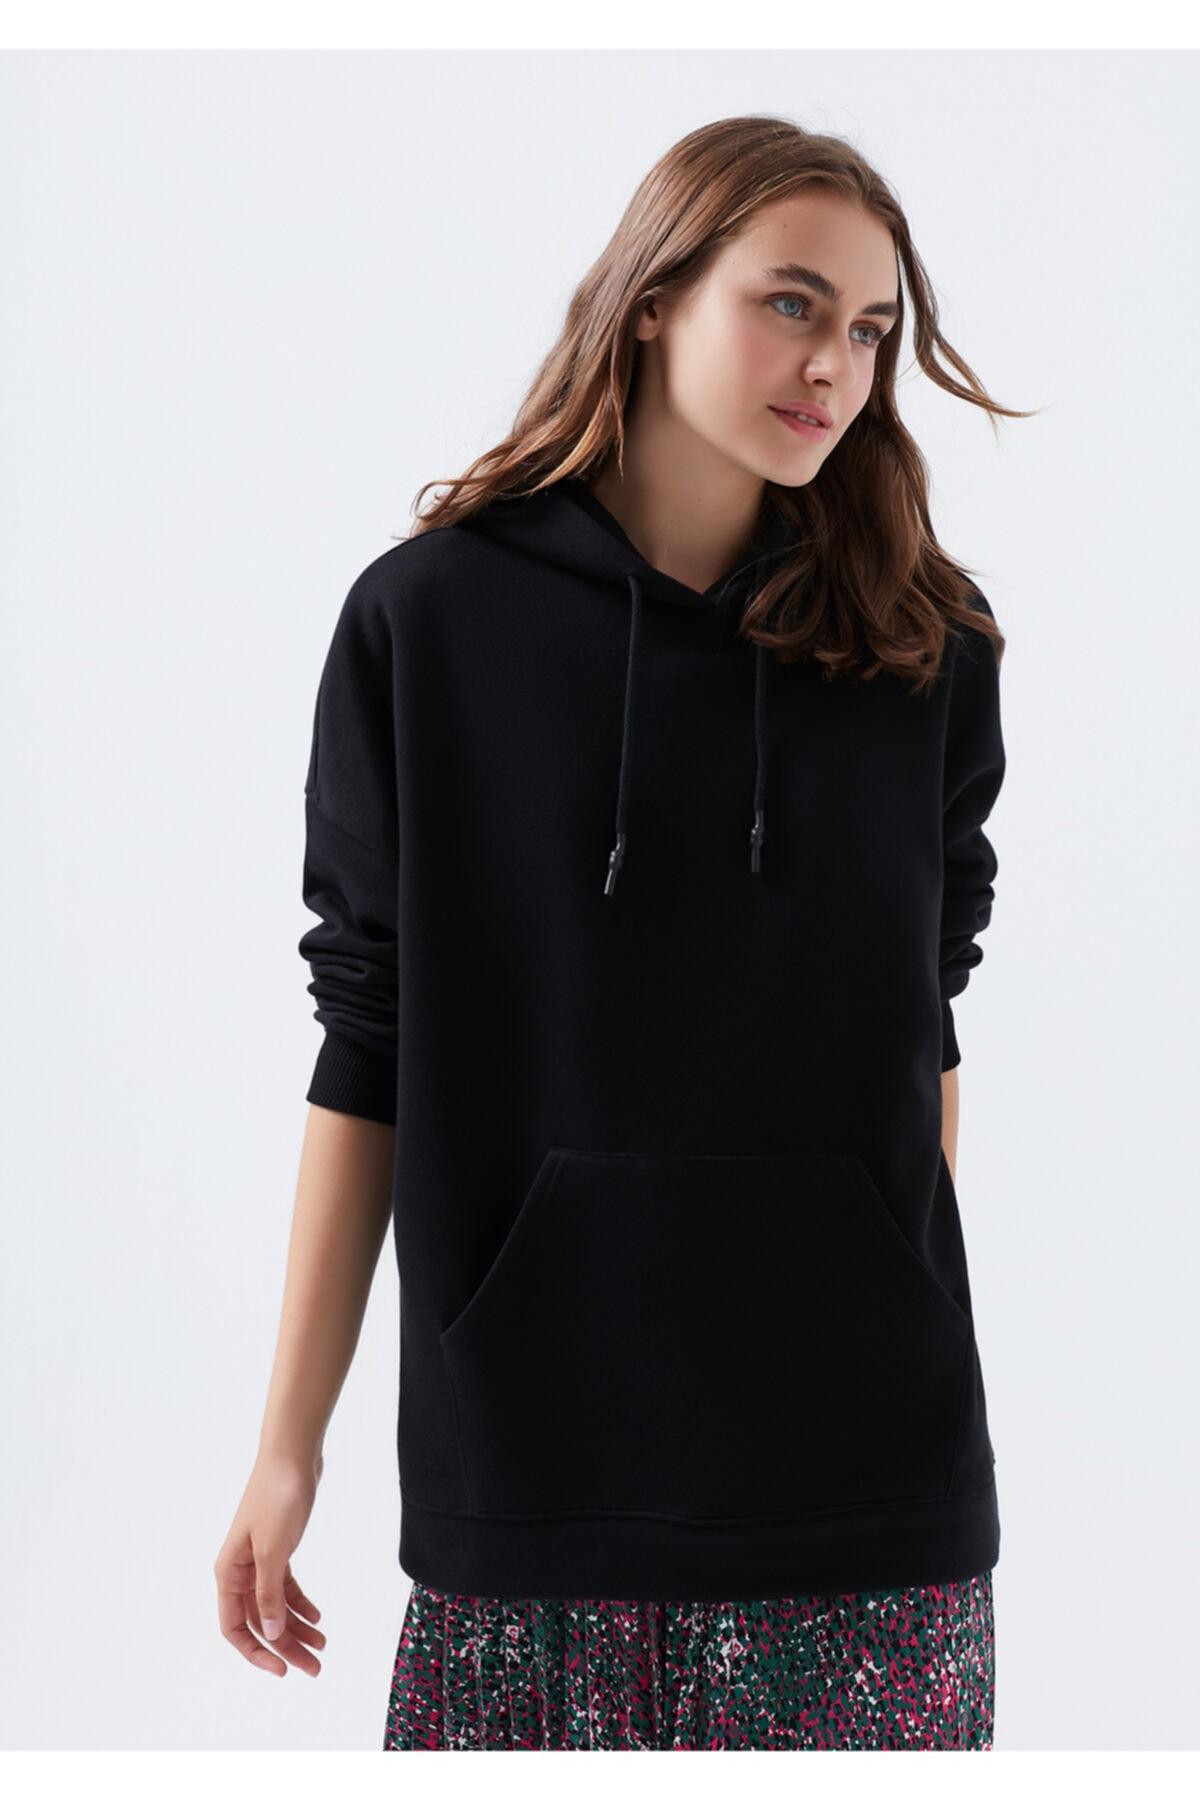 Mavi Kapüşonlu Siyah Sweatshirt 2